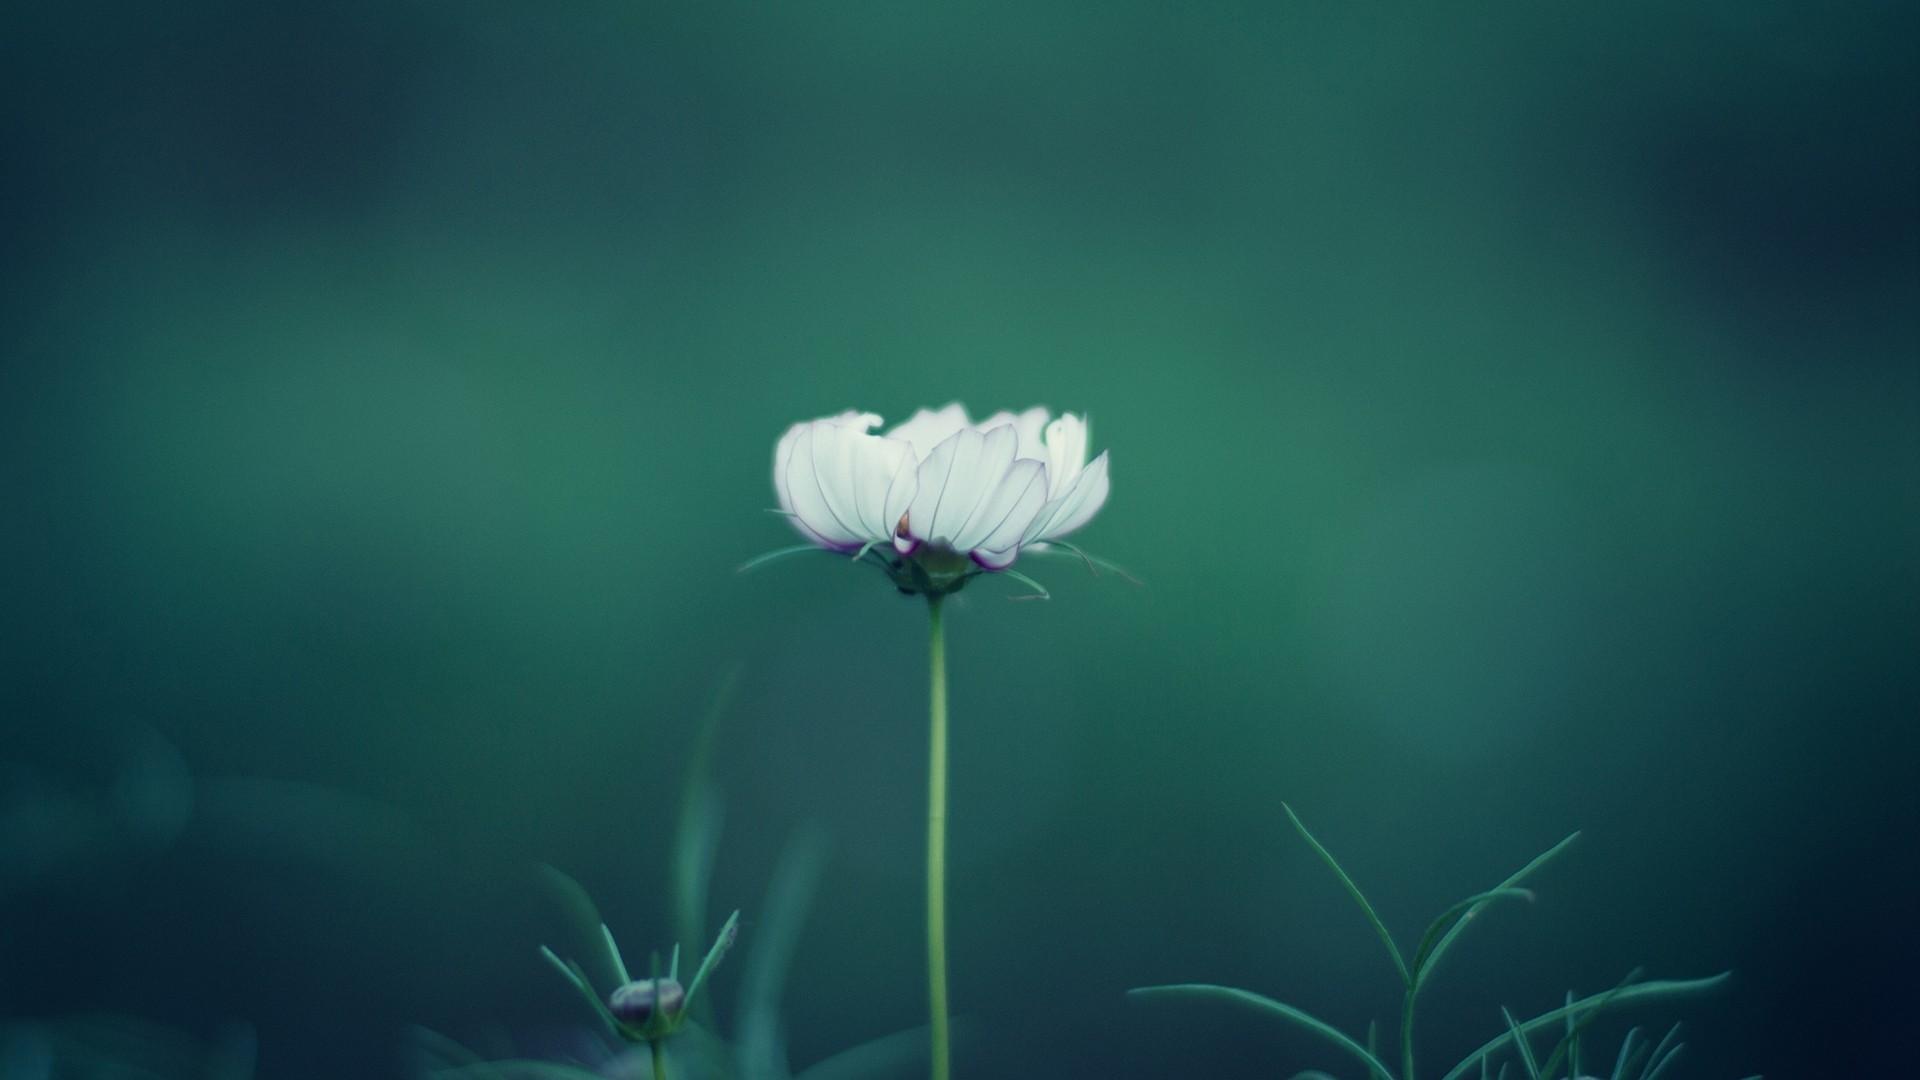 Flower Minimalist HD Wallpaper